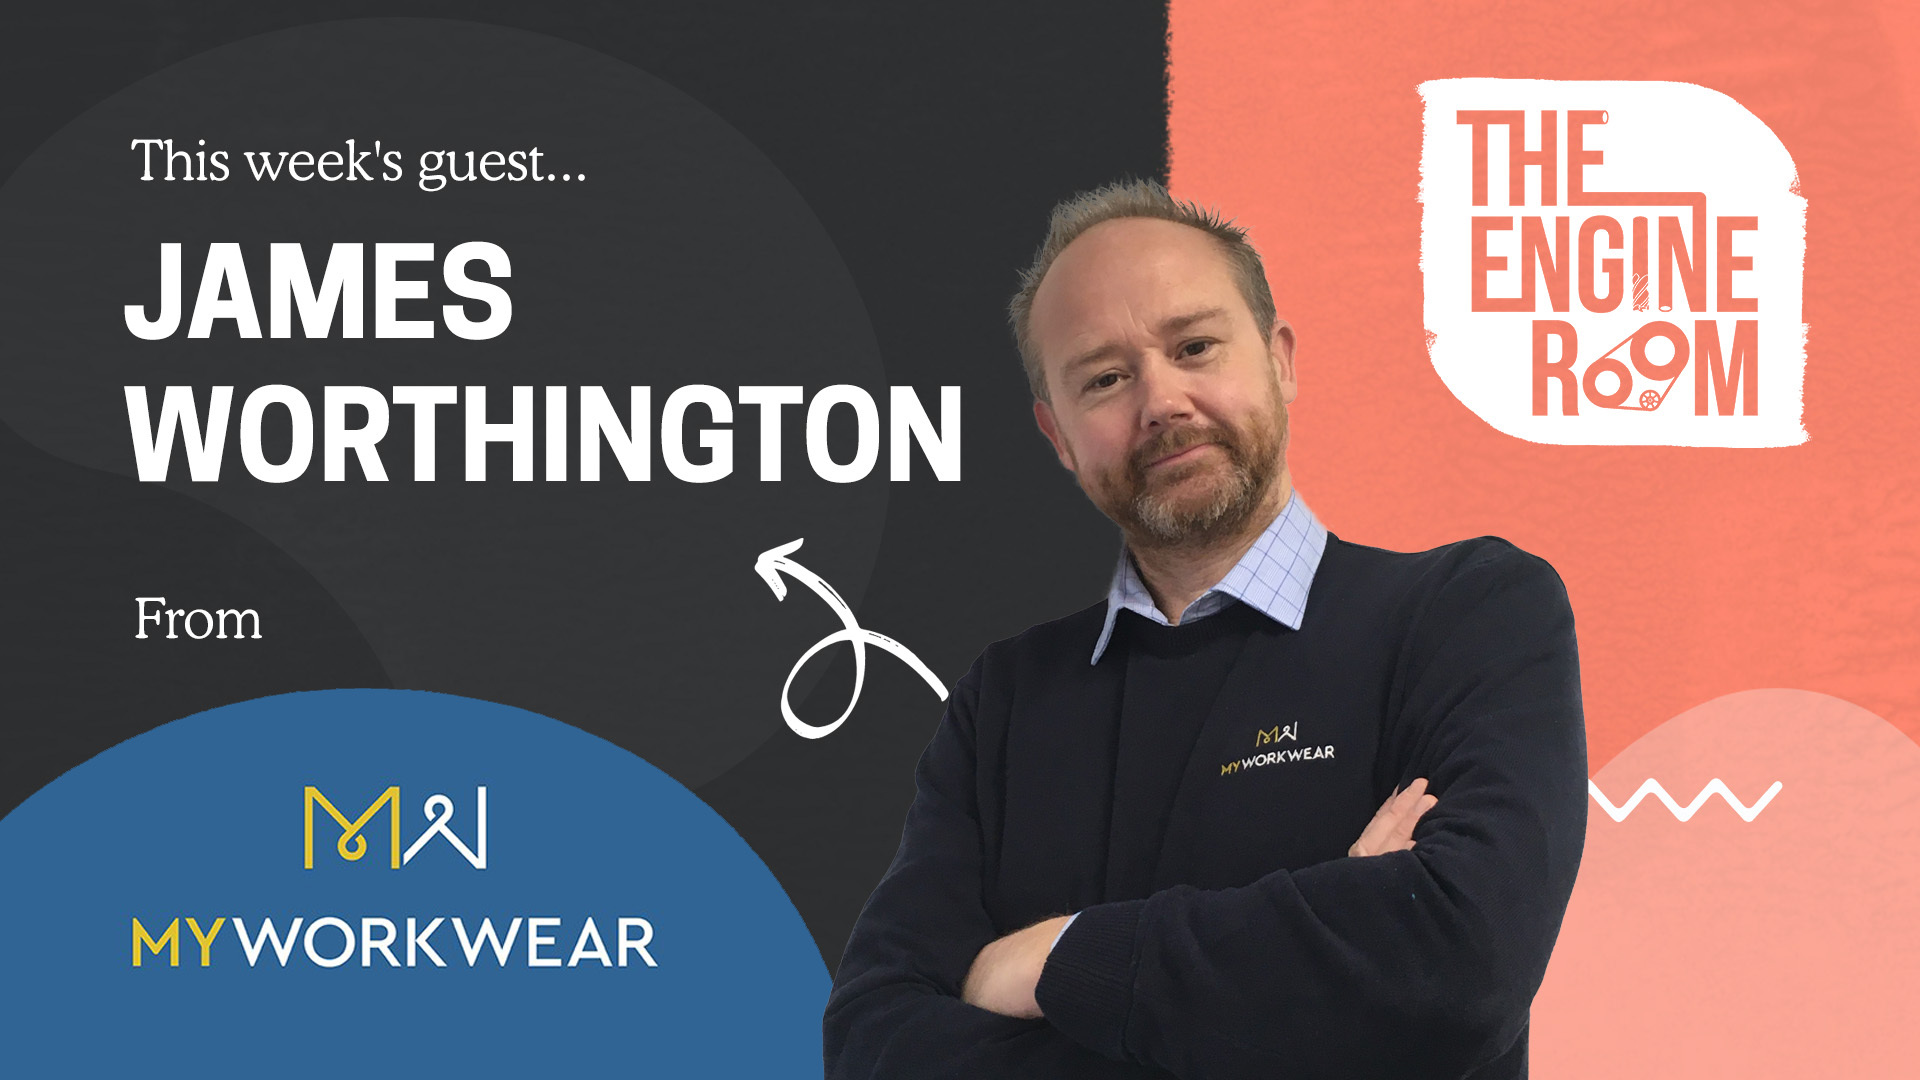 James Worthington